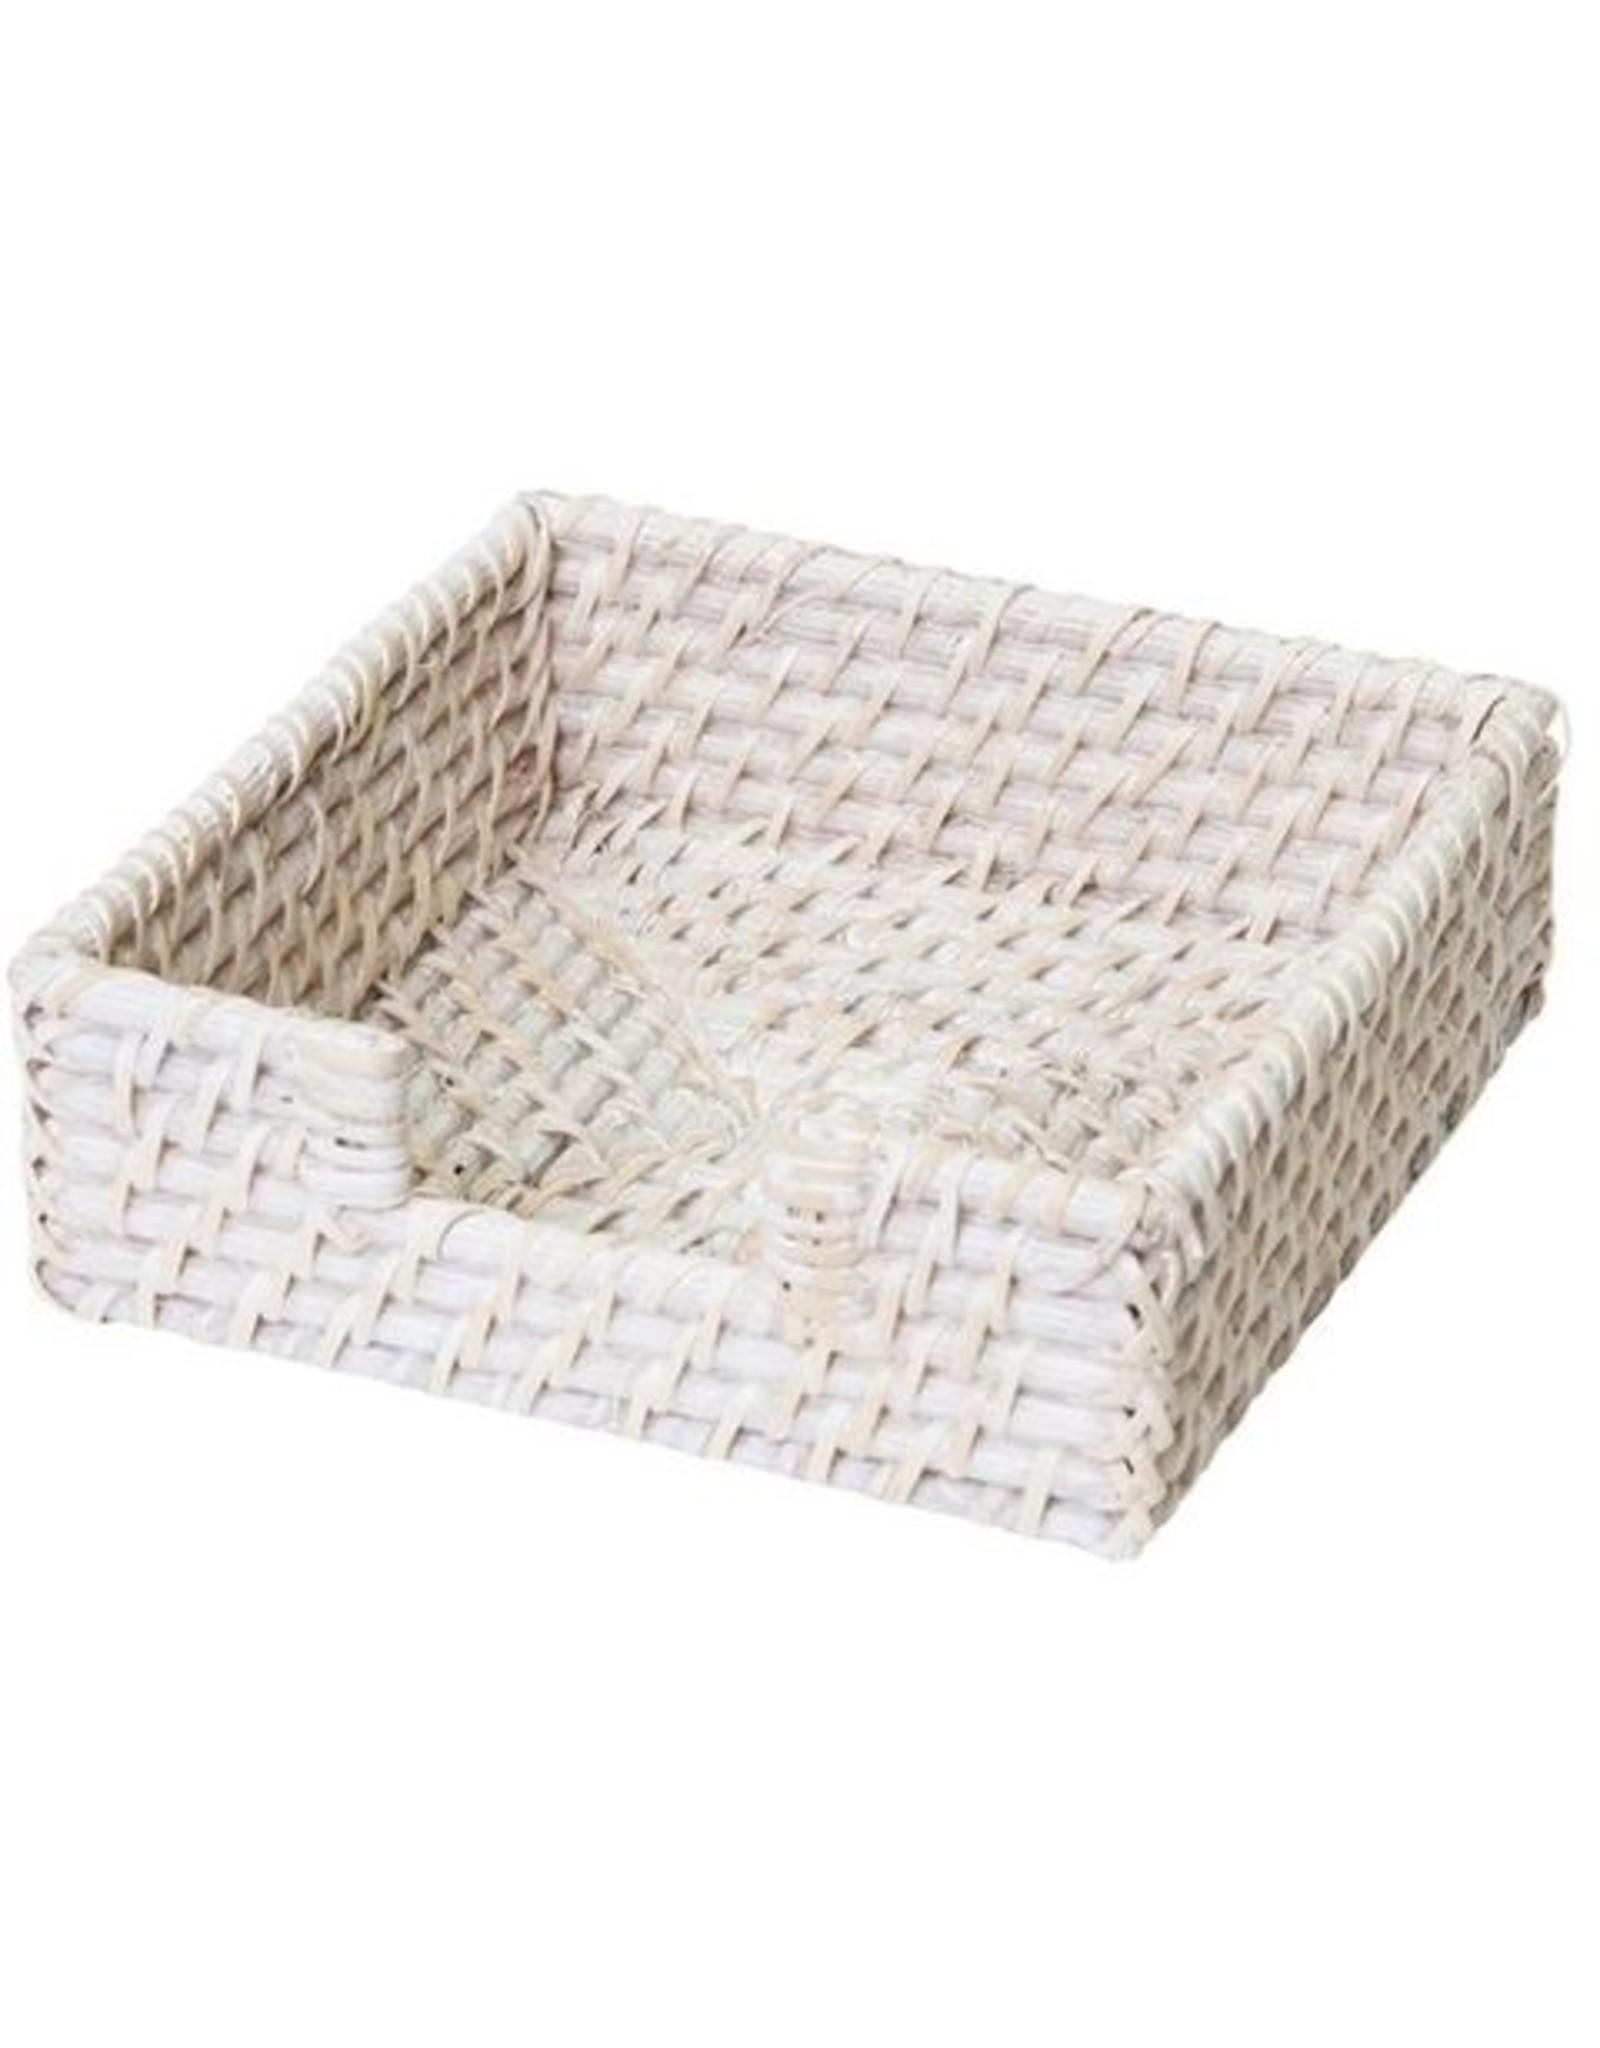 Pacifica Rattan Napkin Holder Square 18cm White Wash